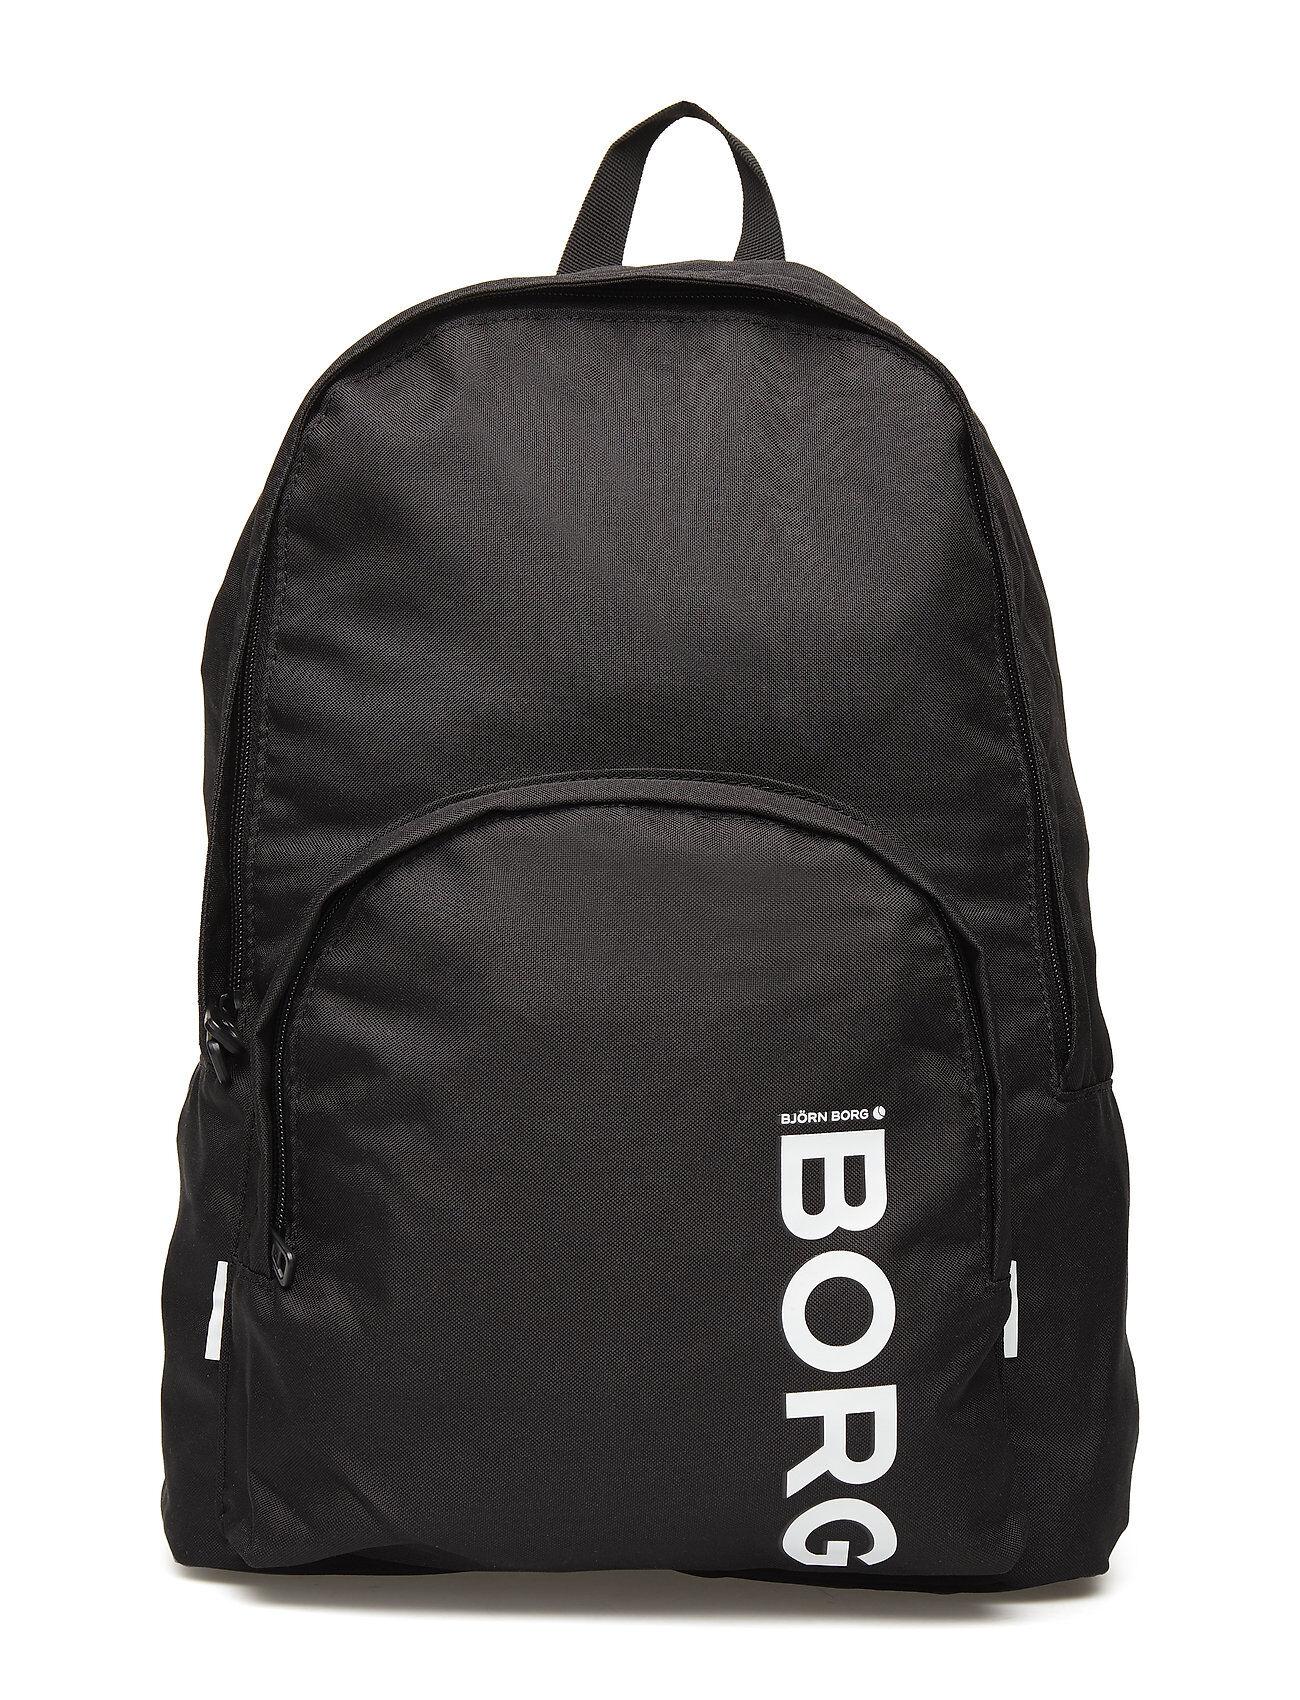 Björn Borg Bags Back Pack